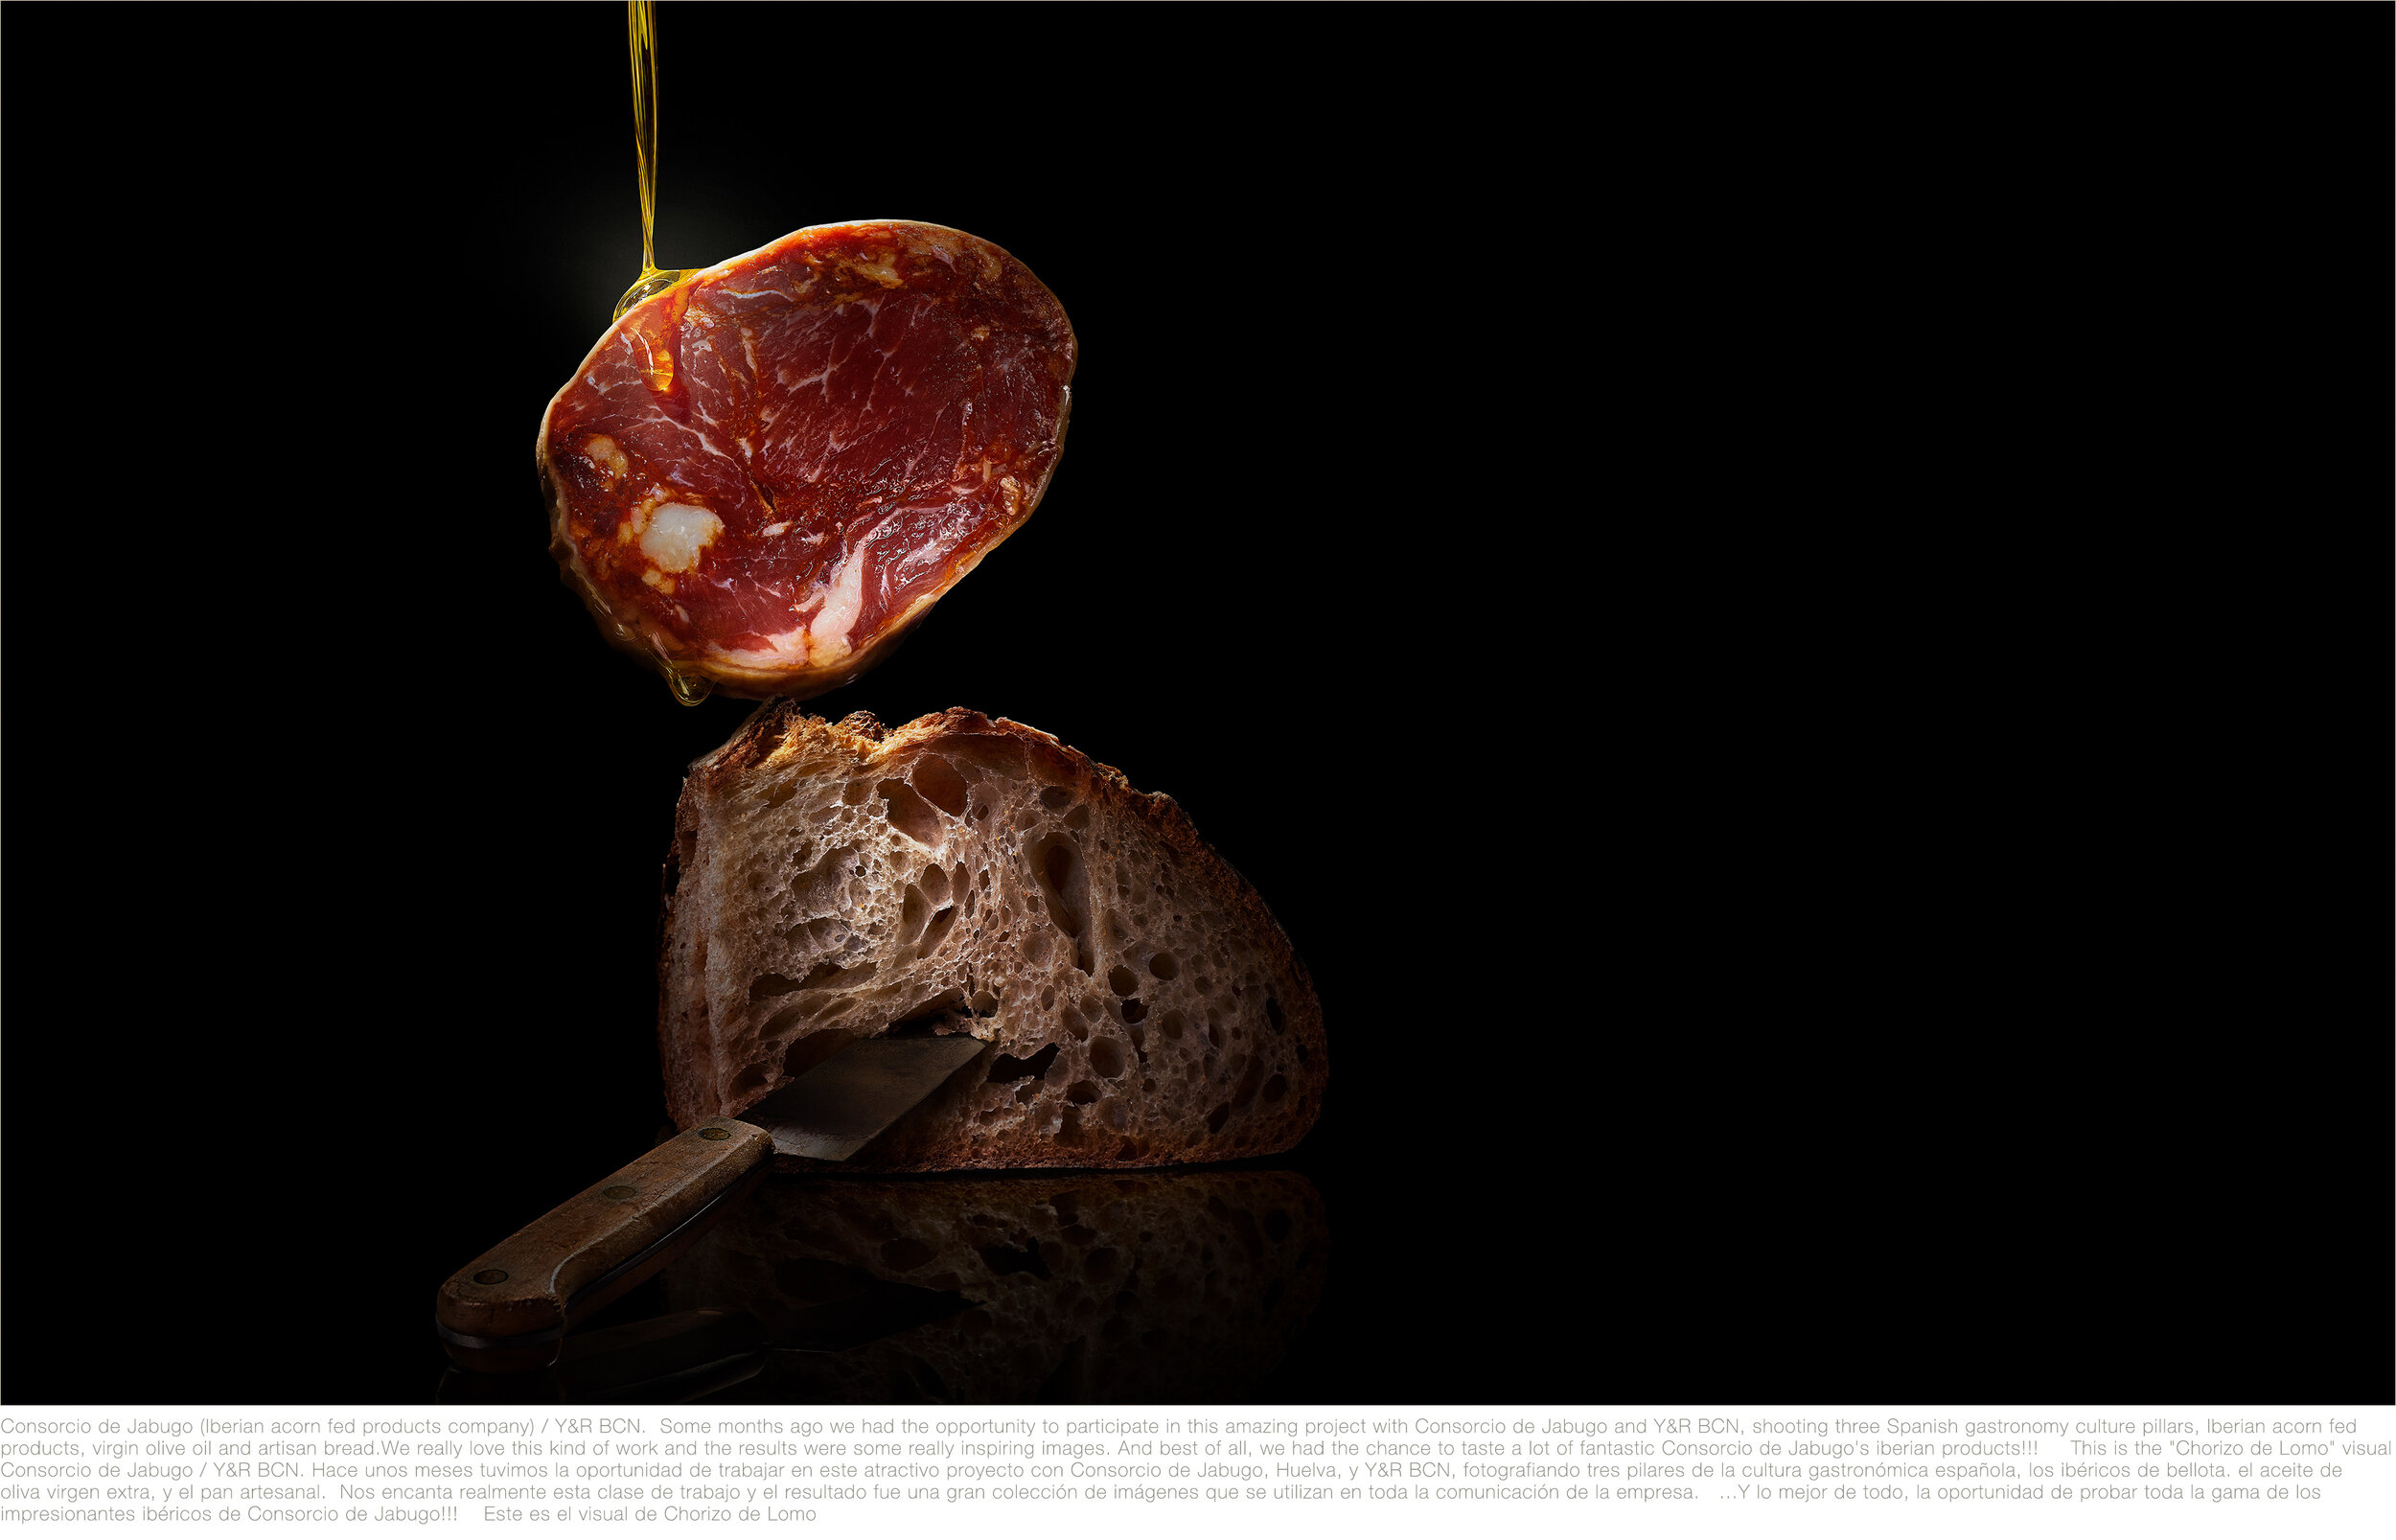 Consorcio-Jabugo-959-Chorizo-Lomo-02-v03.jpg